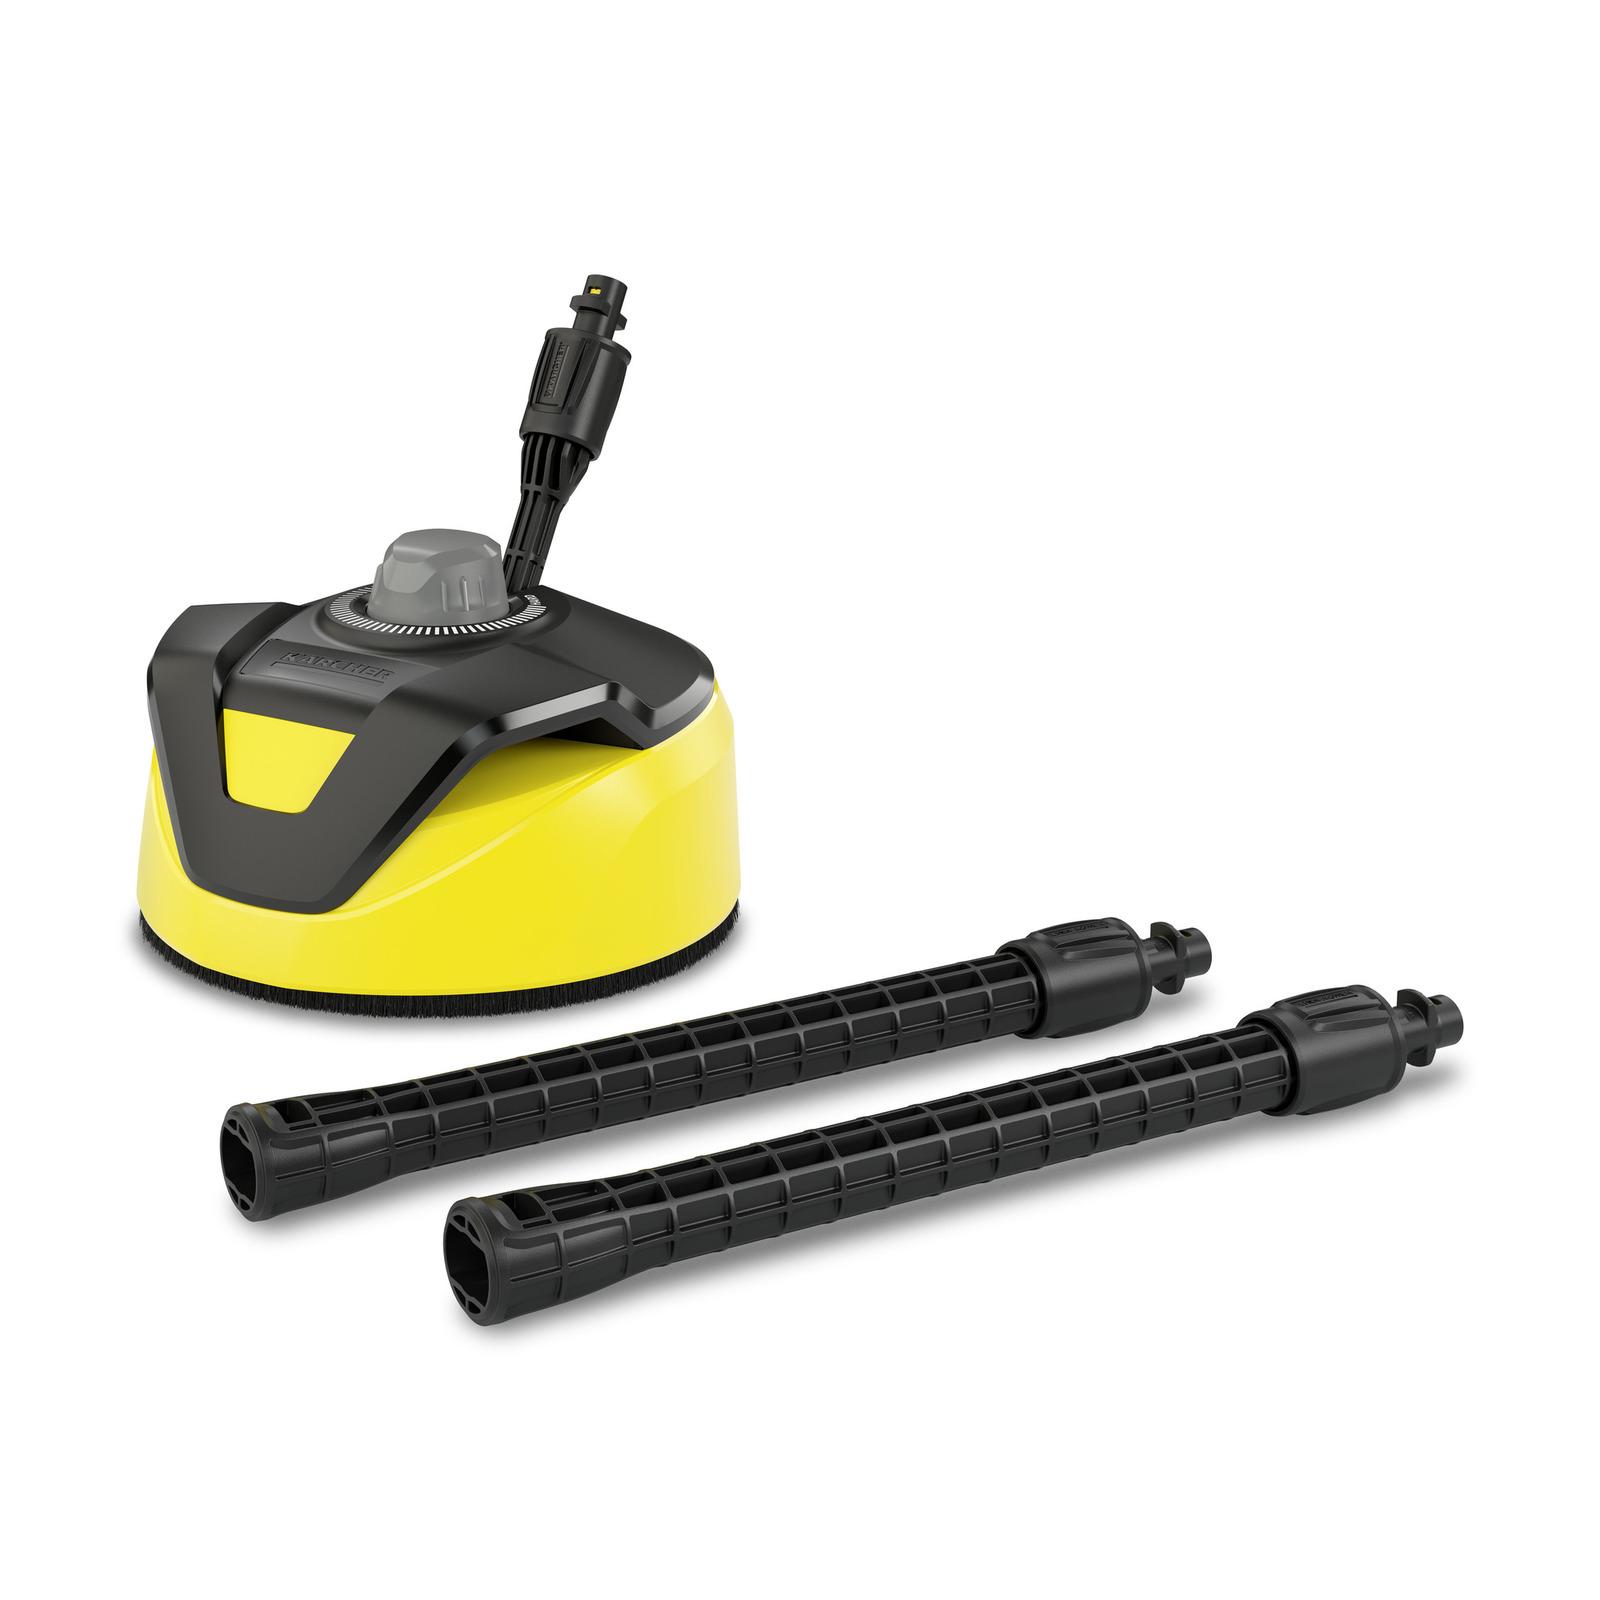 Kärcher - T5 Surface Cleaner